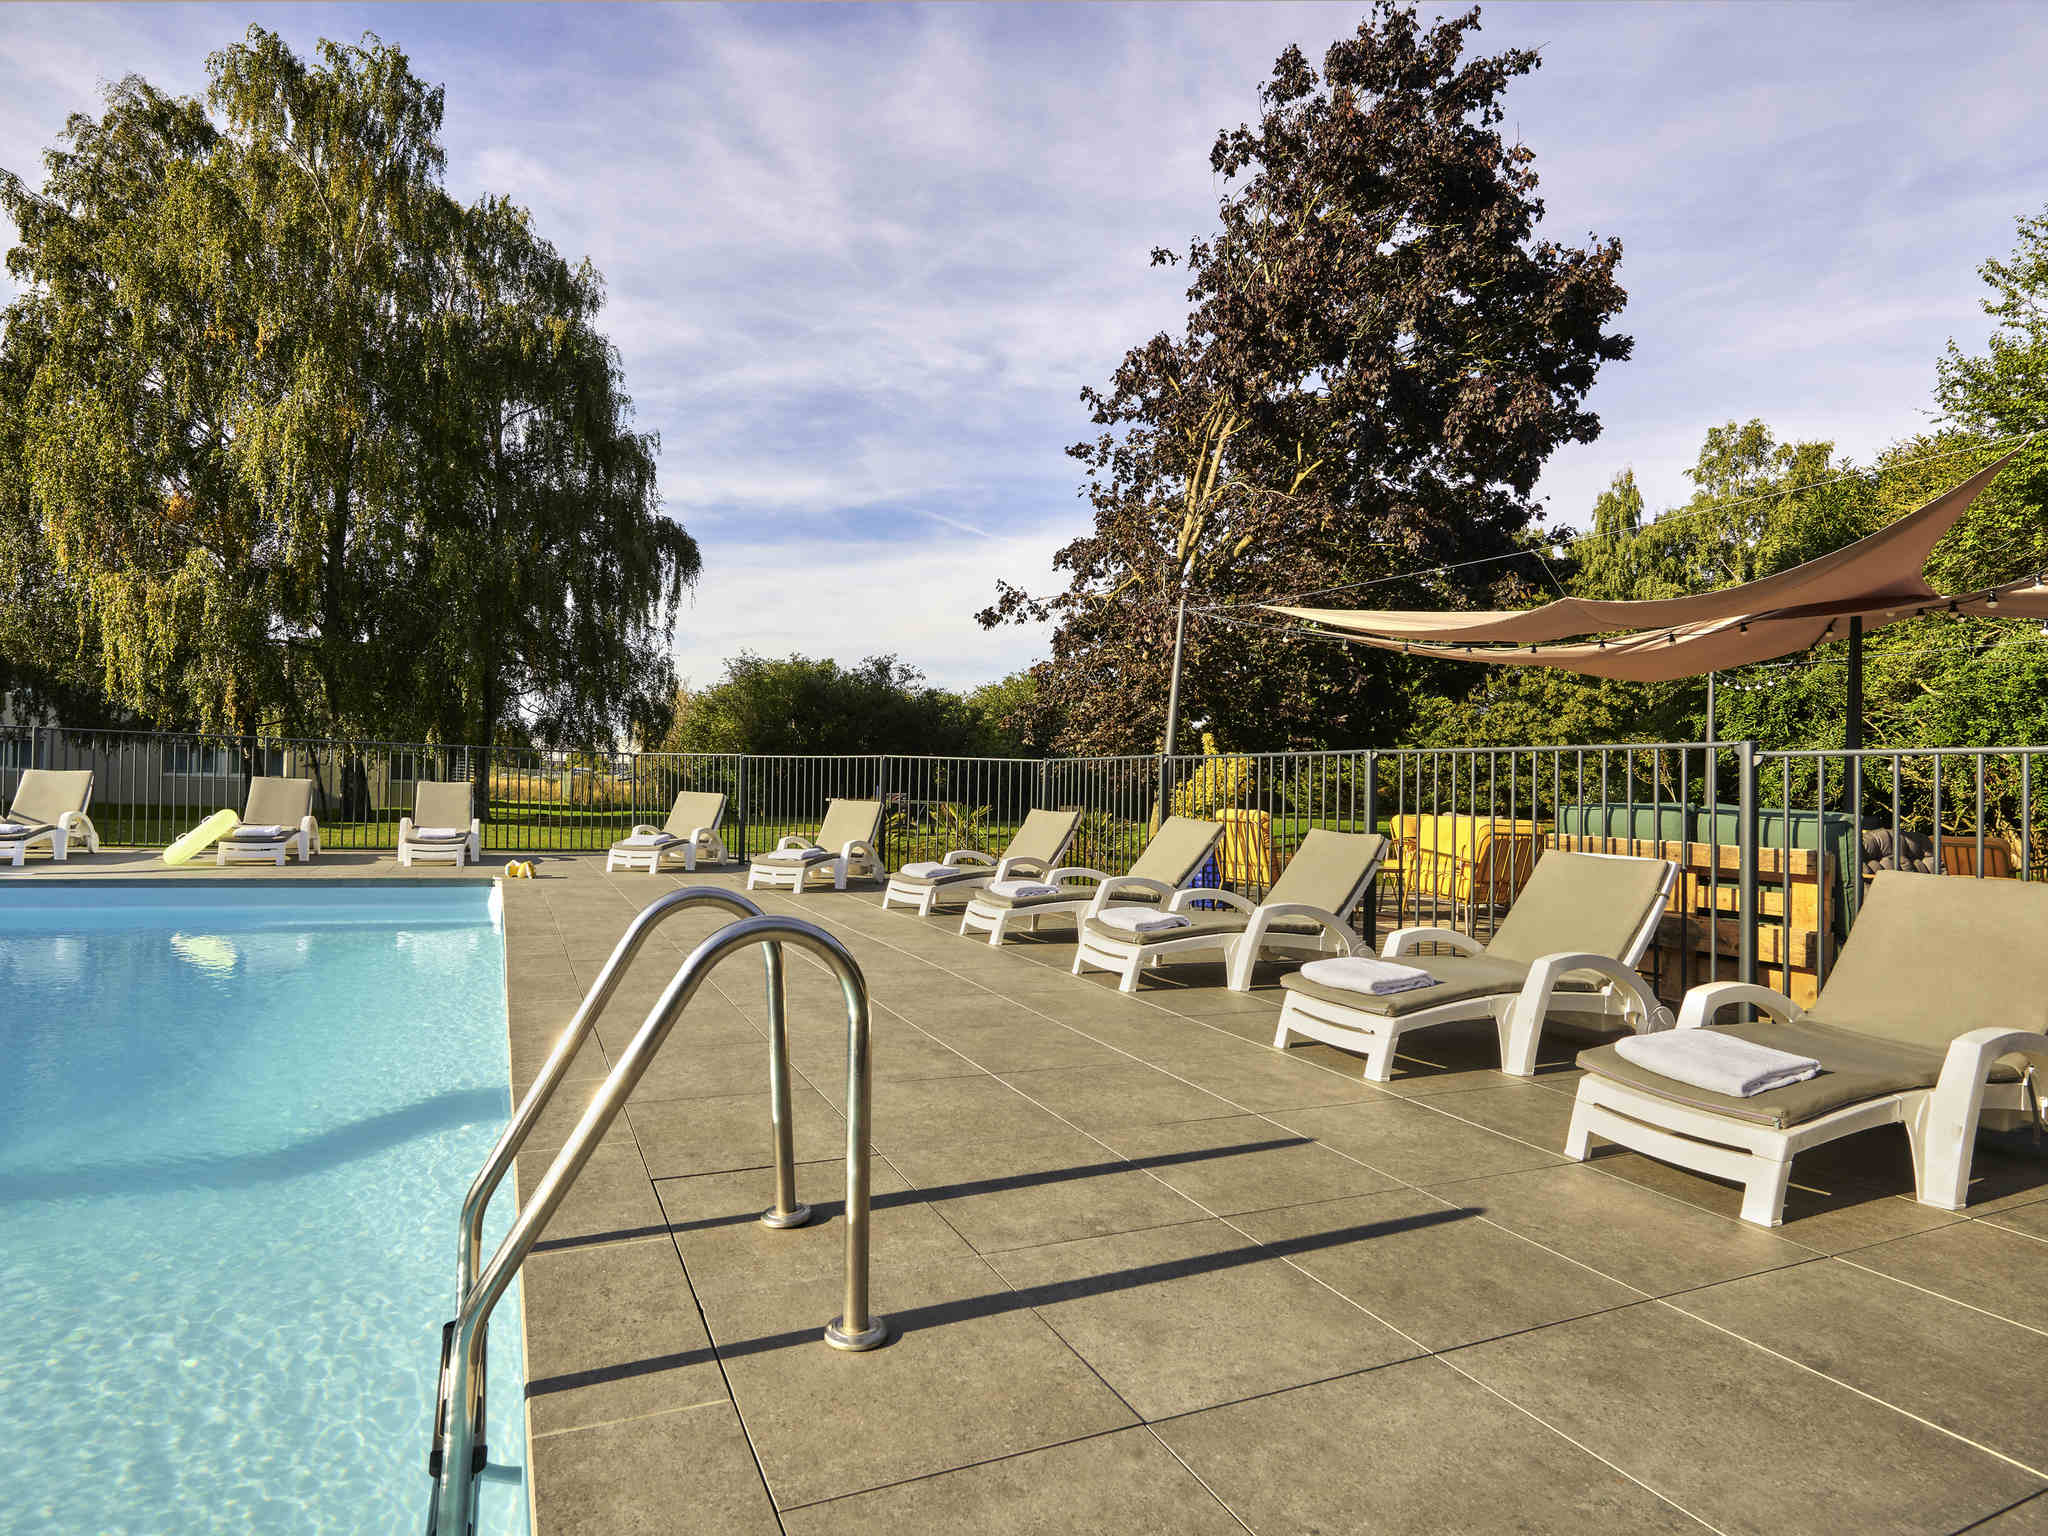 Hotel - Novotel Survilliers Saint-Witz